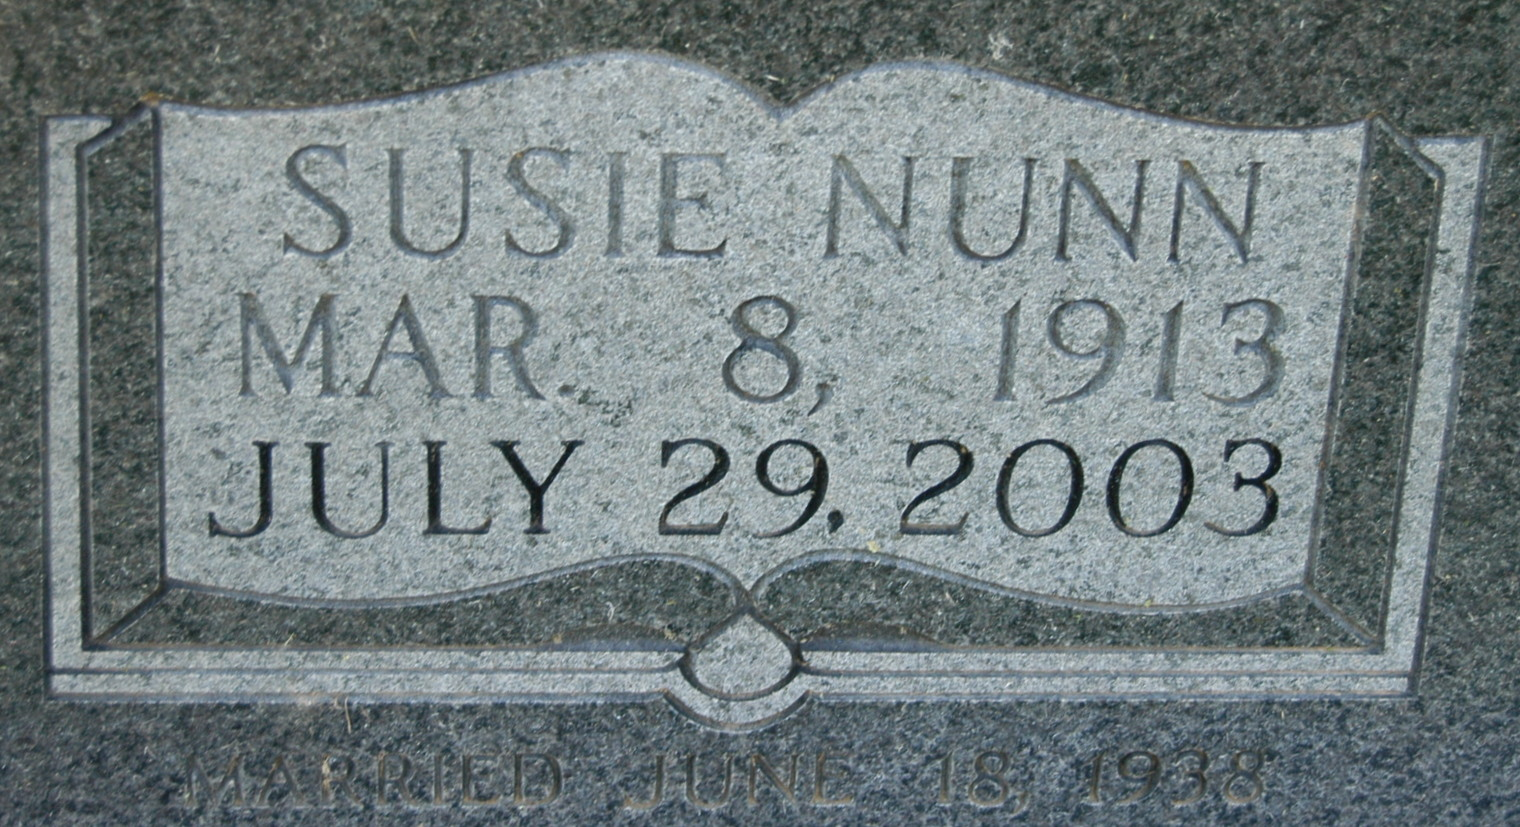 Susie <i>Nunn</i> Harbison